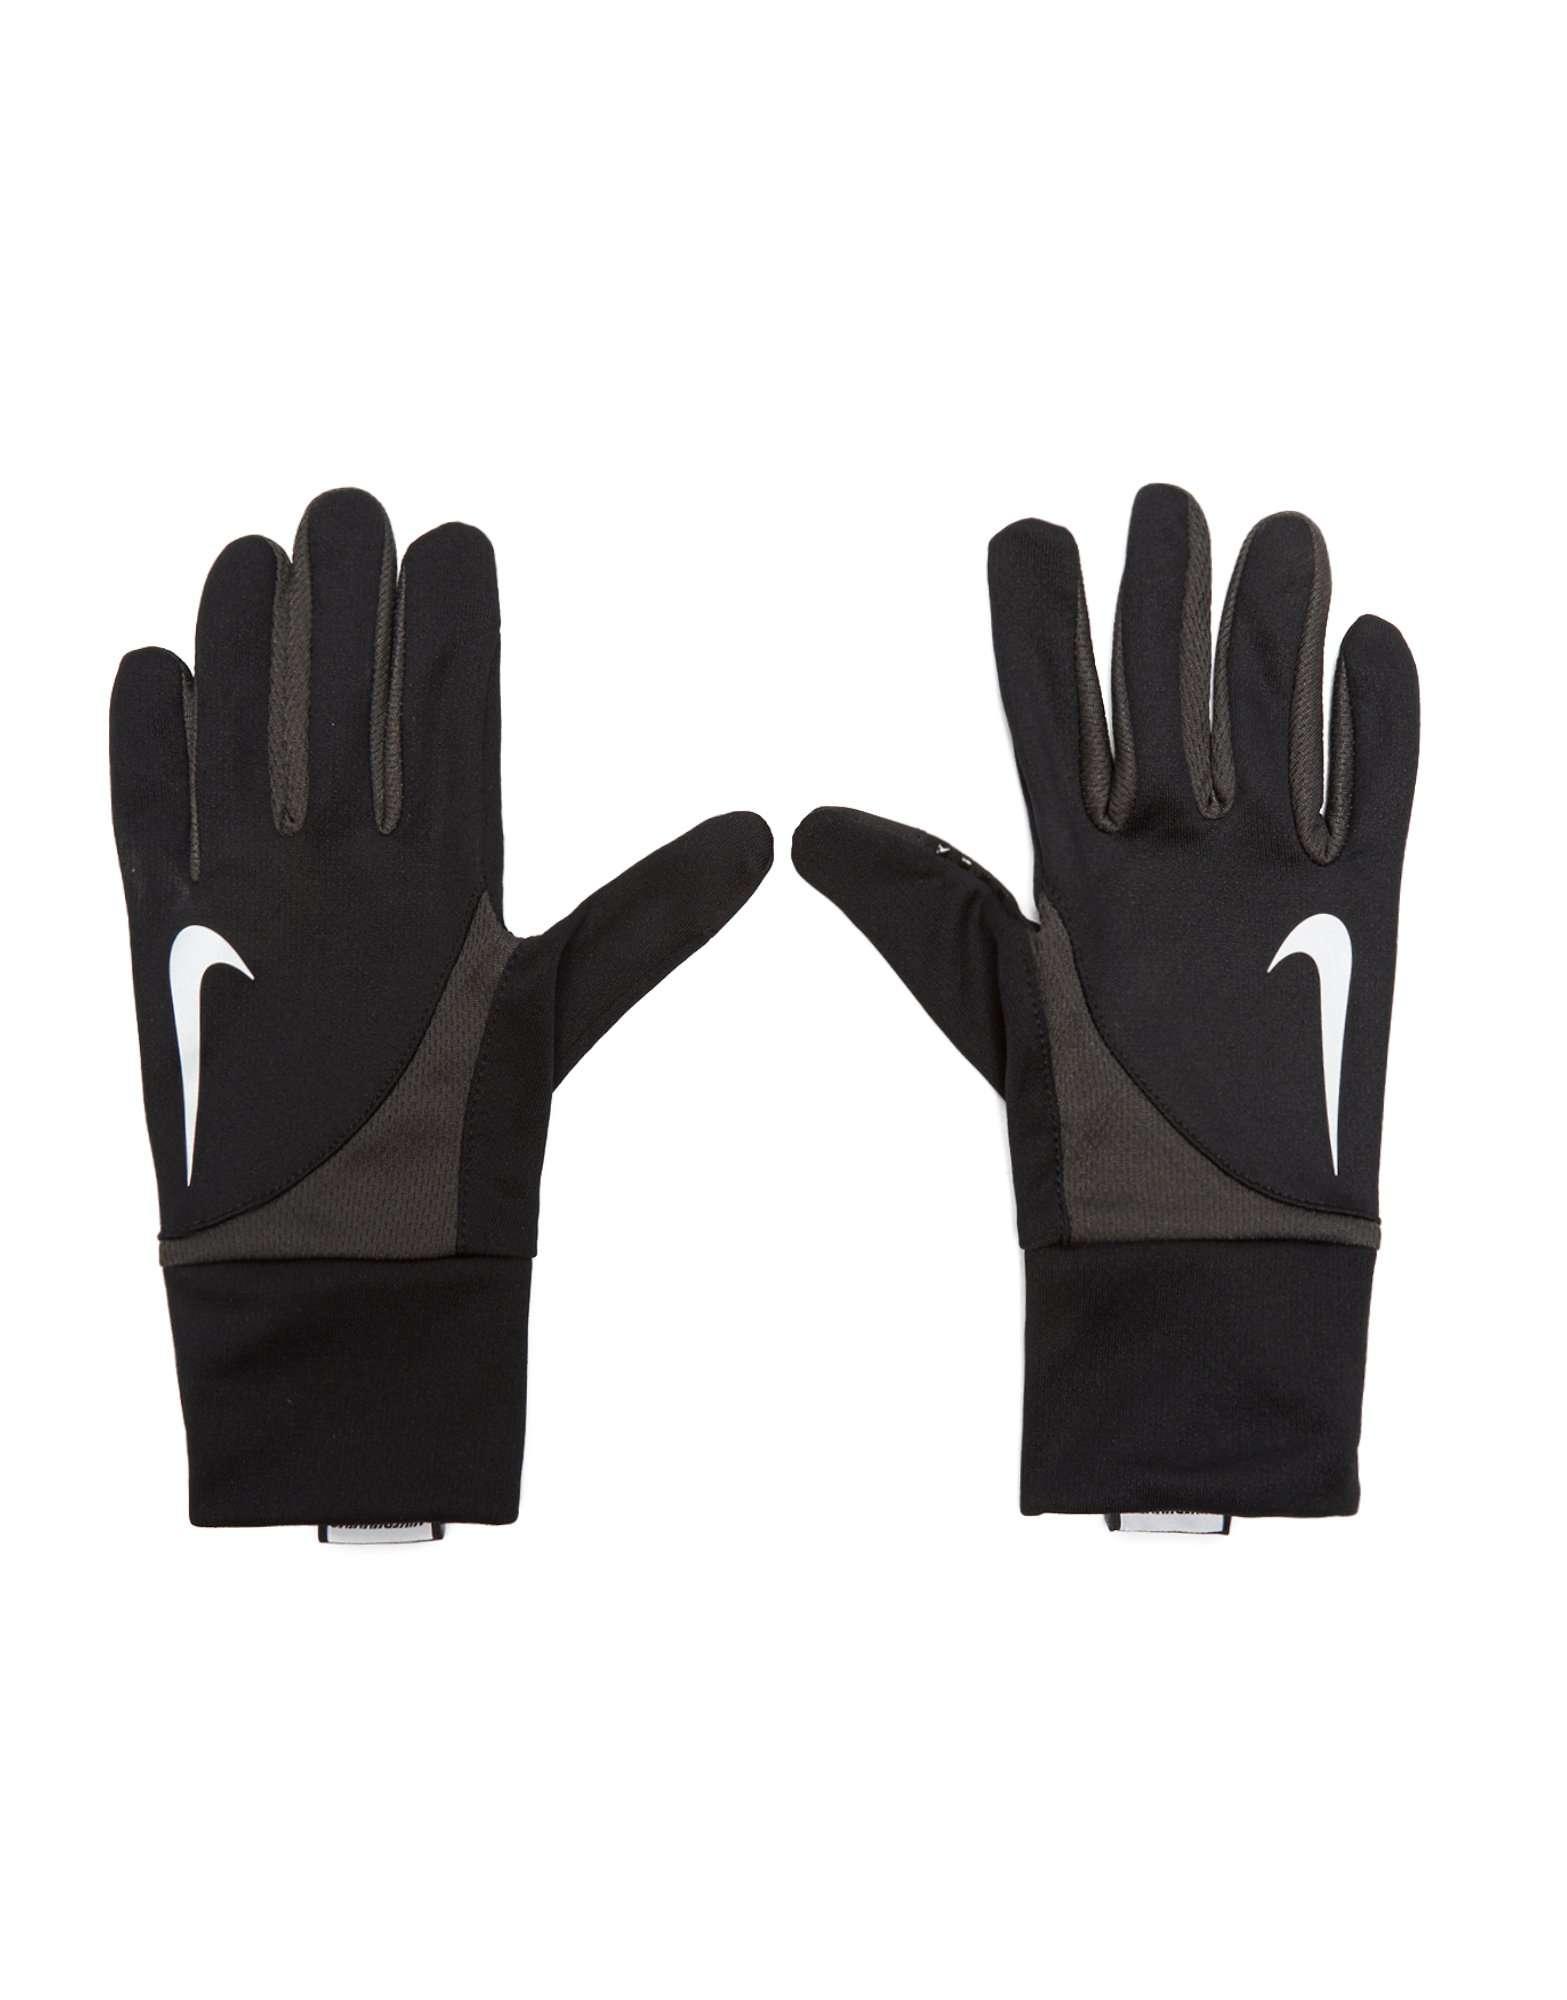 Leather gloves mens jd - Leather Gloves Mens Jd 6